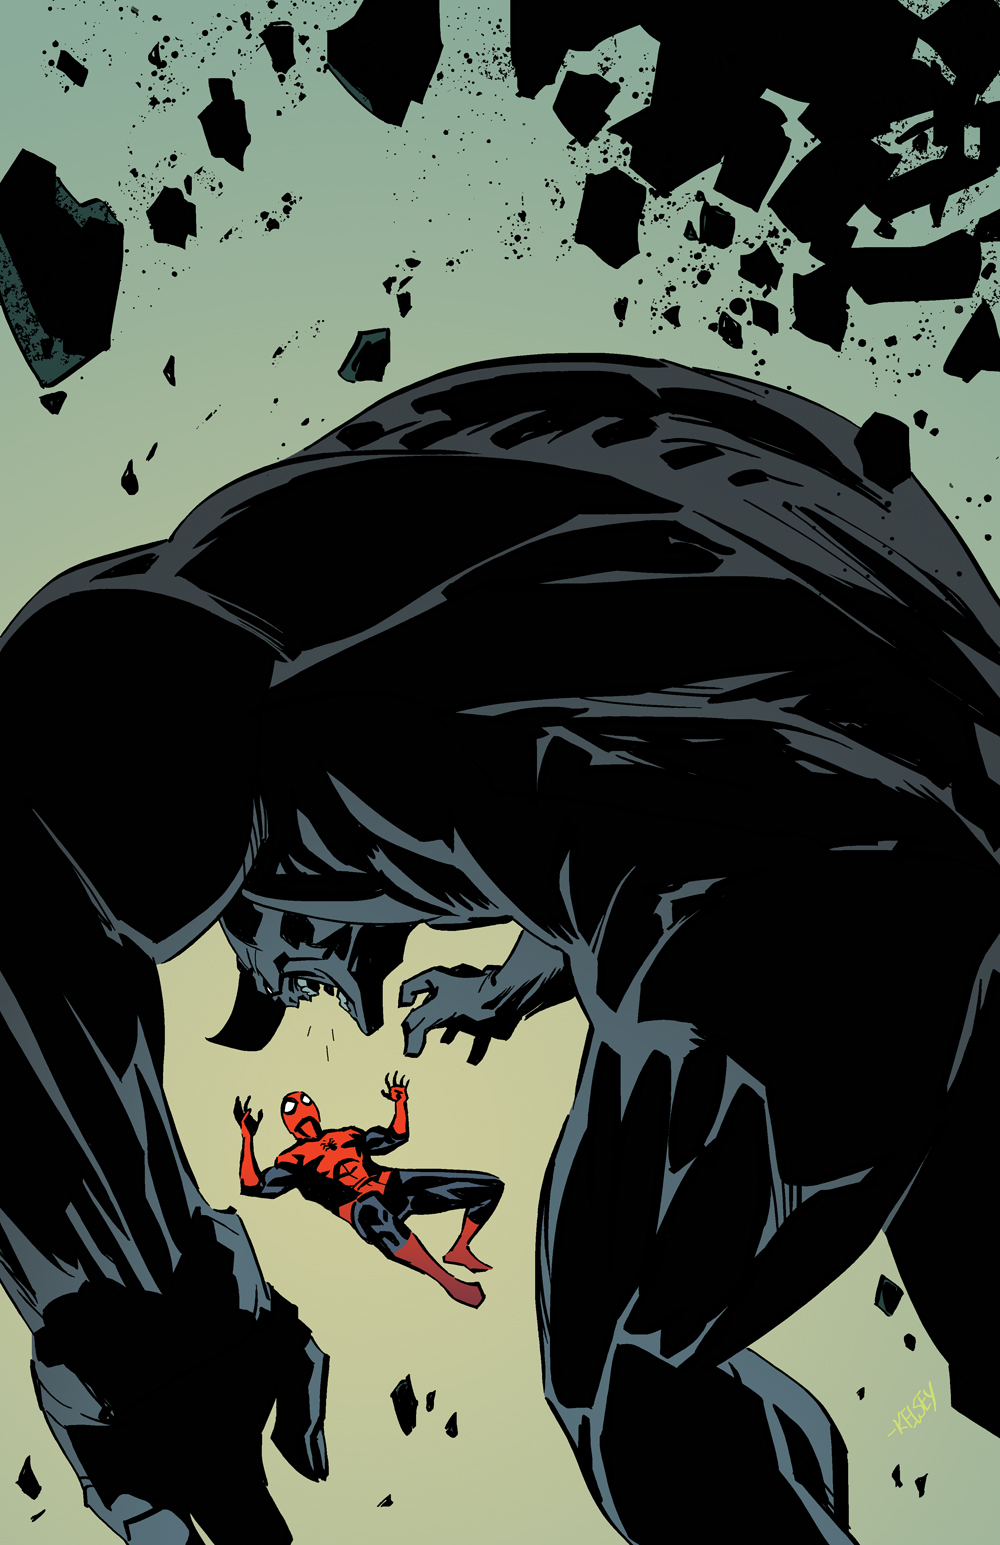 spiderman vs Rhino by Roboworks